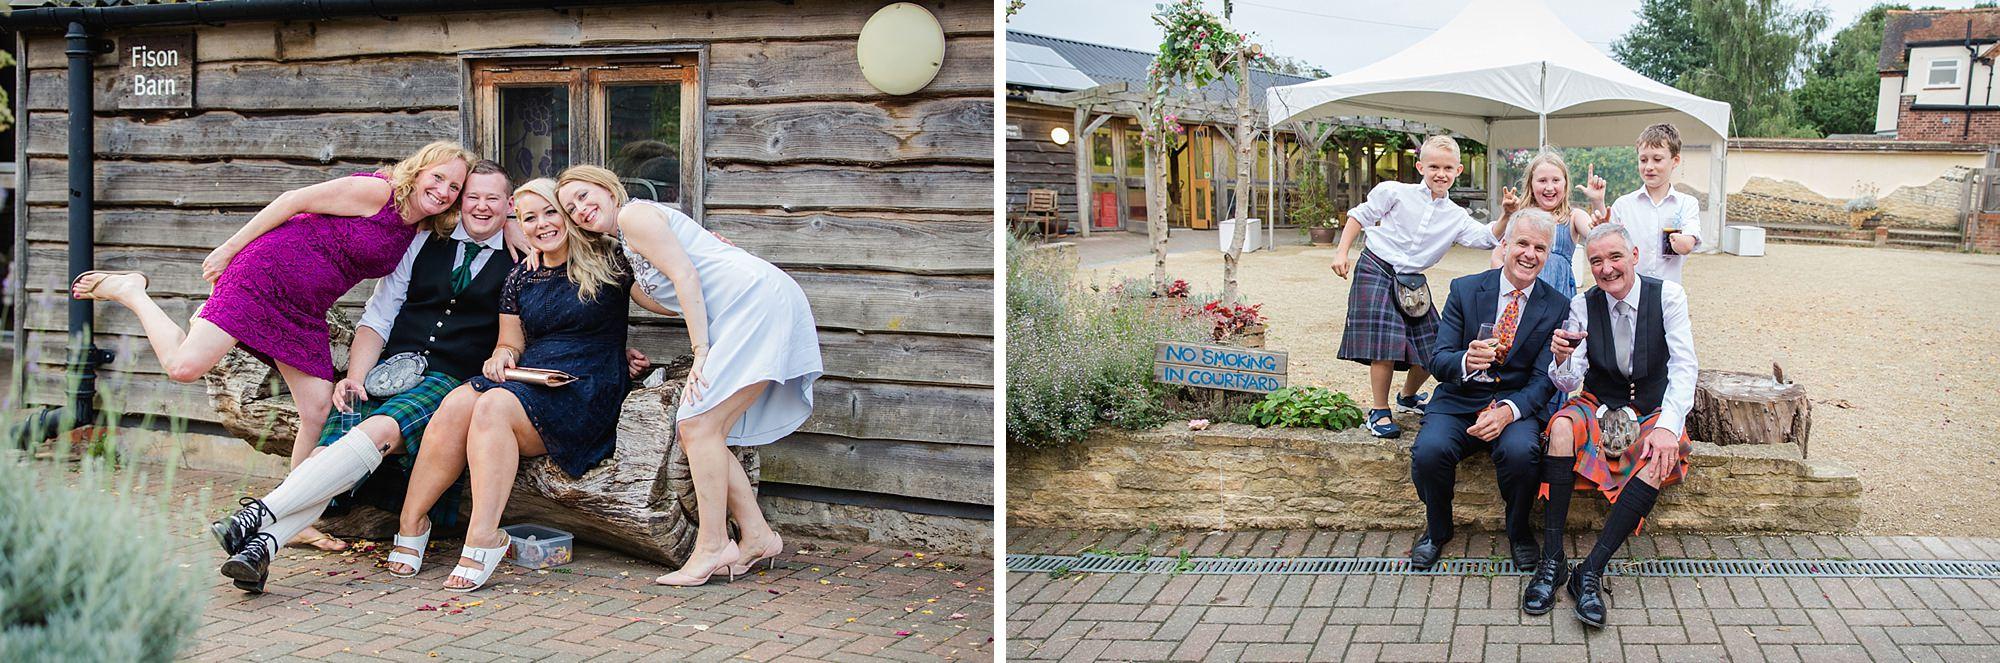 outdoor humanist wedding photography fun wedding guests